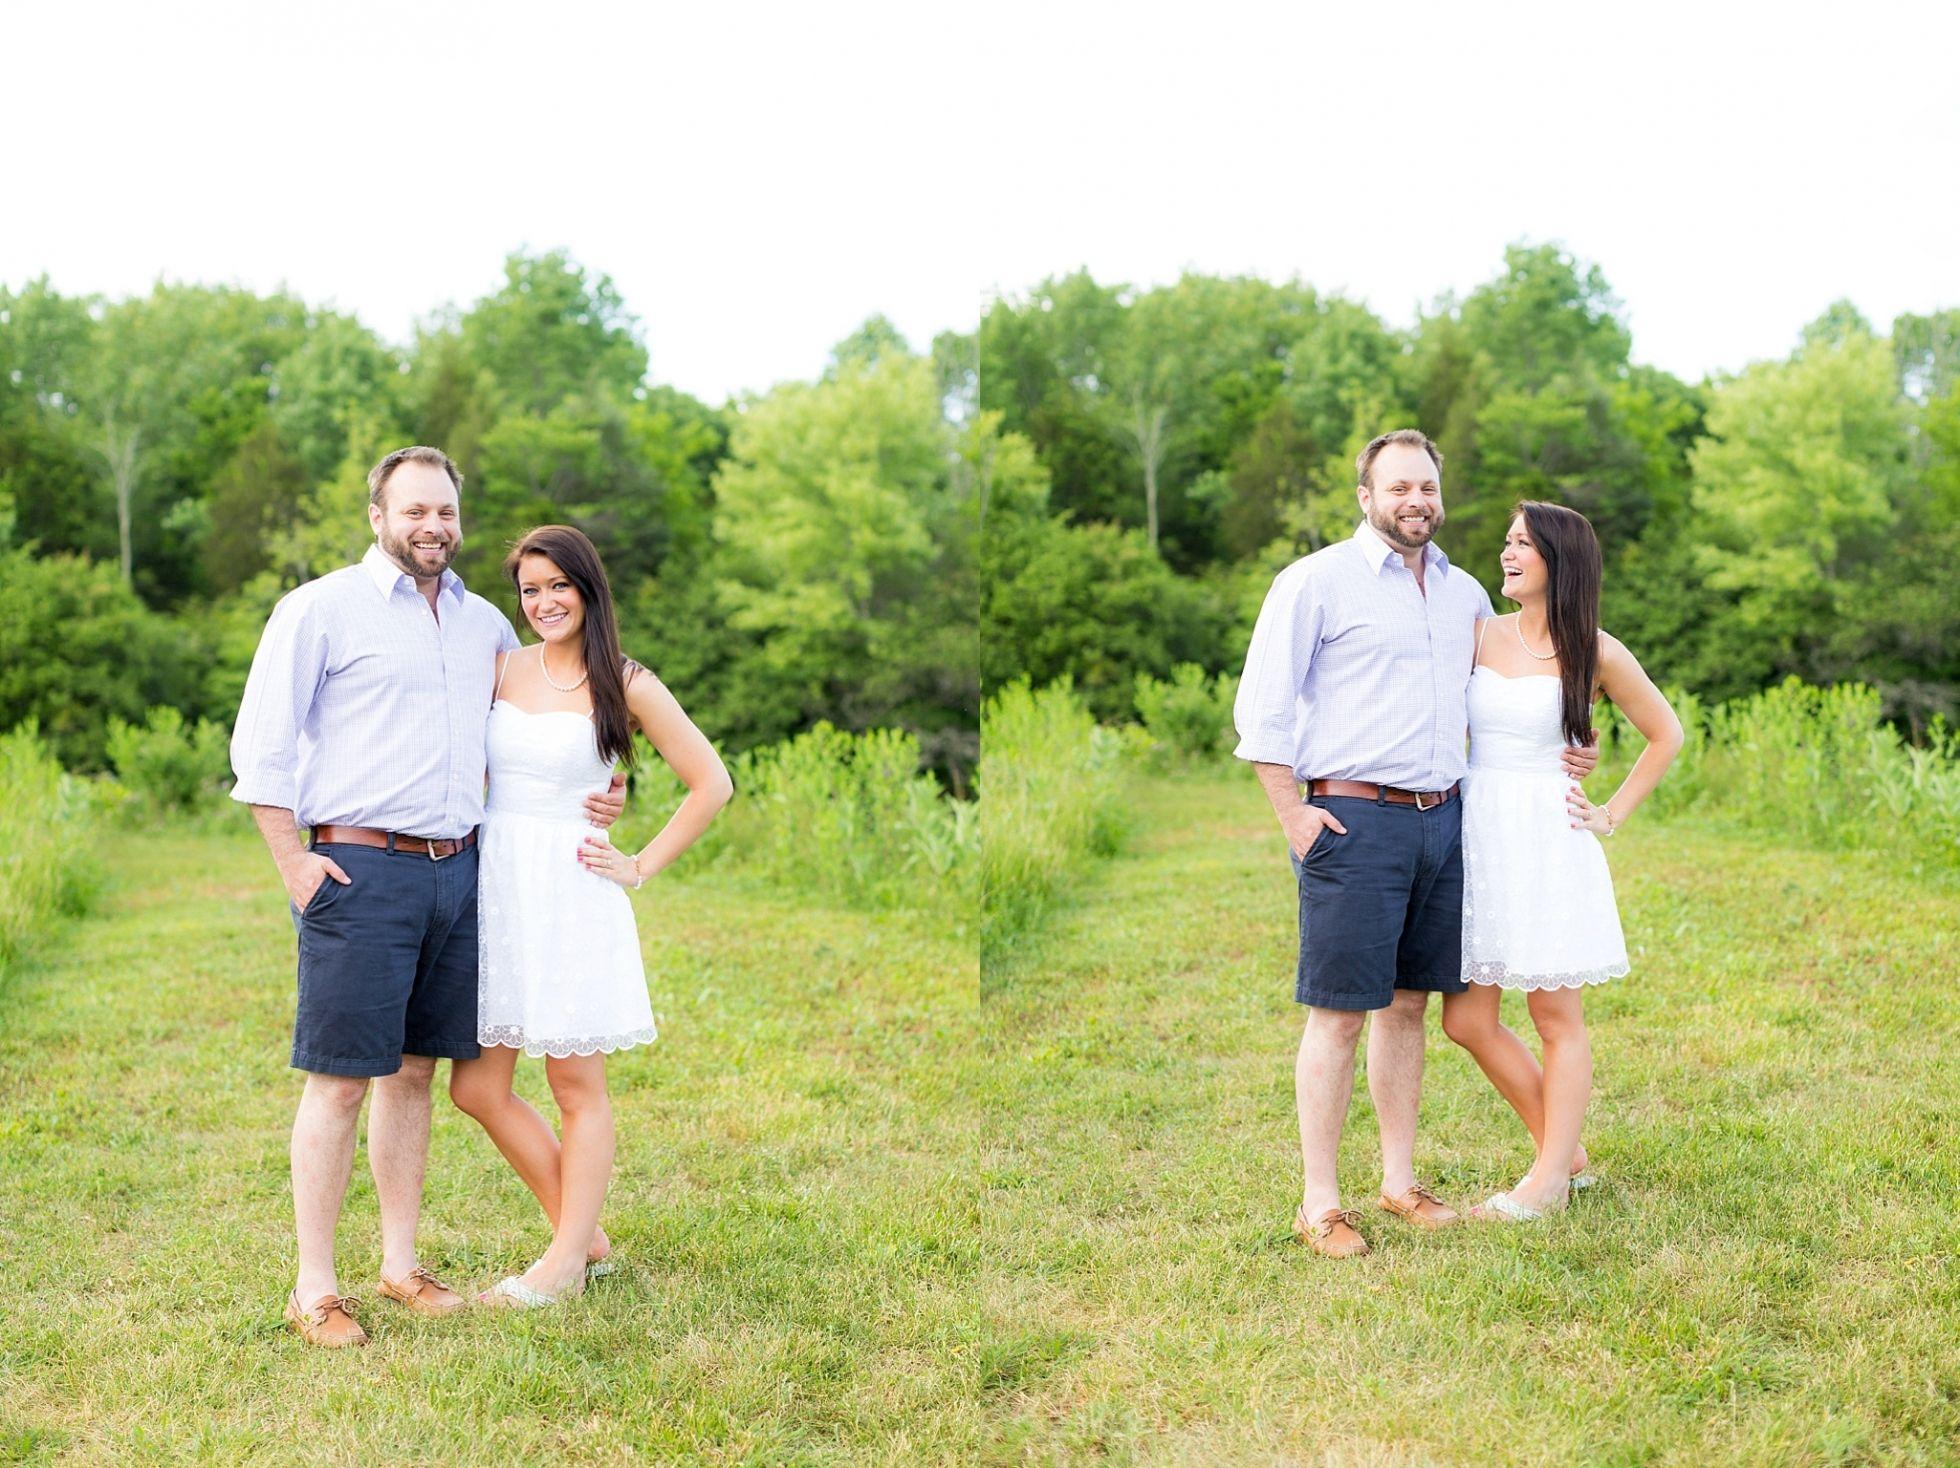 melton lake engagement photography knoxville wedding photographer eden bliss weddings